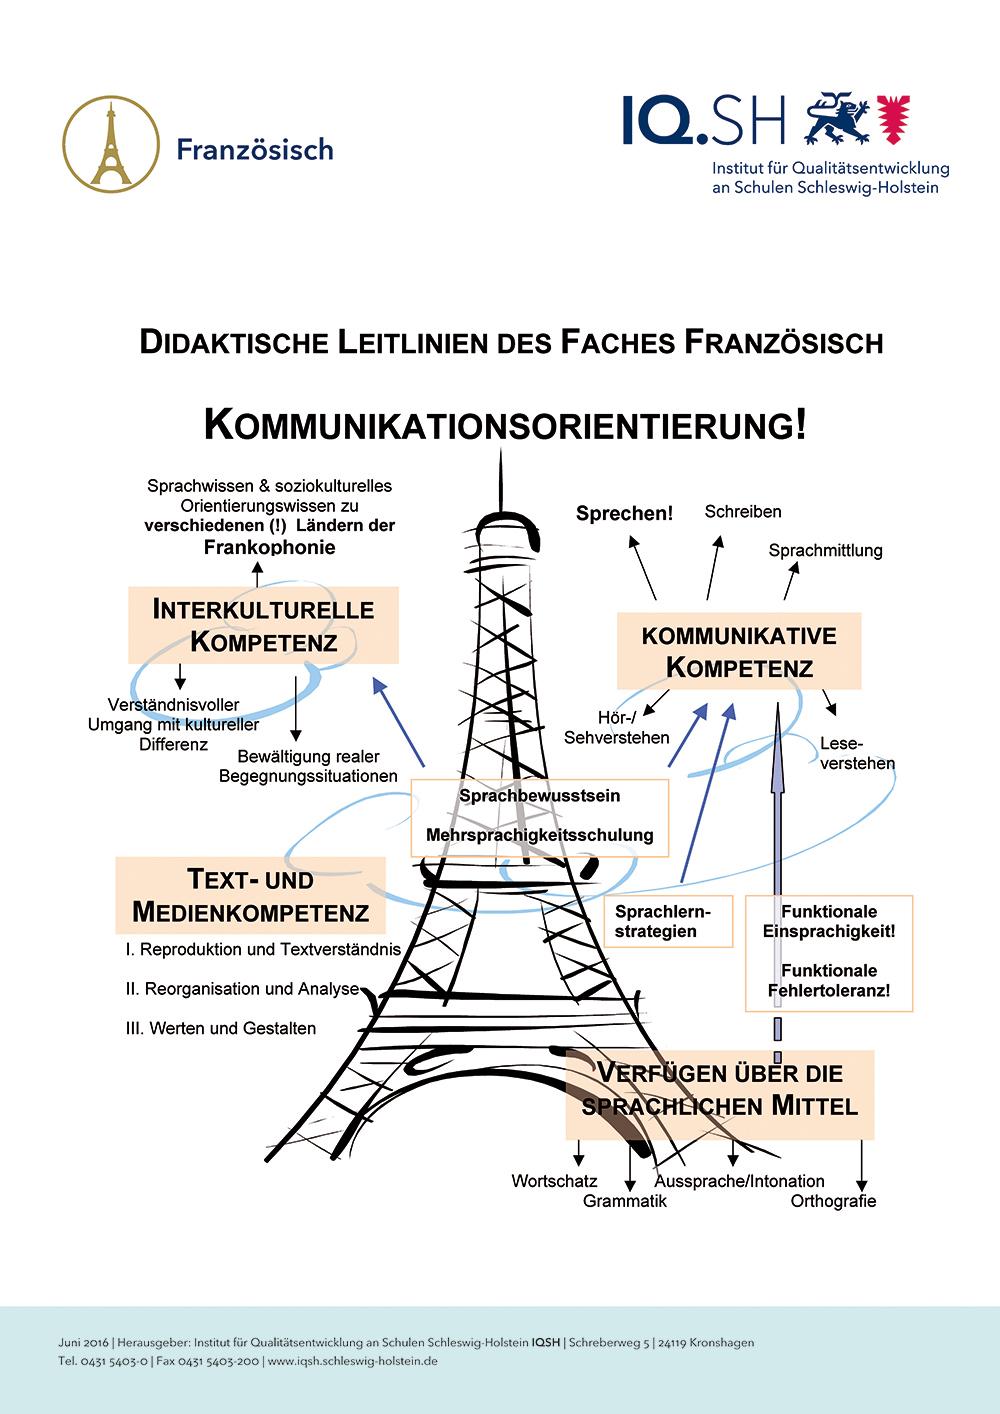 Französisch.jpg?auto=compress,format&colorquant=1600